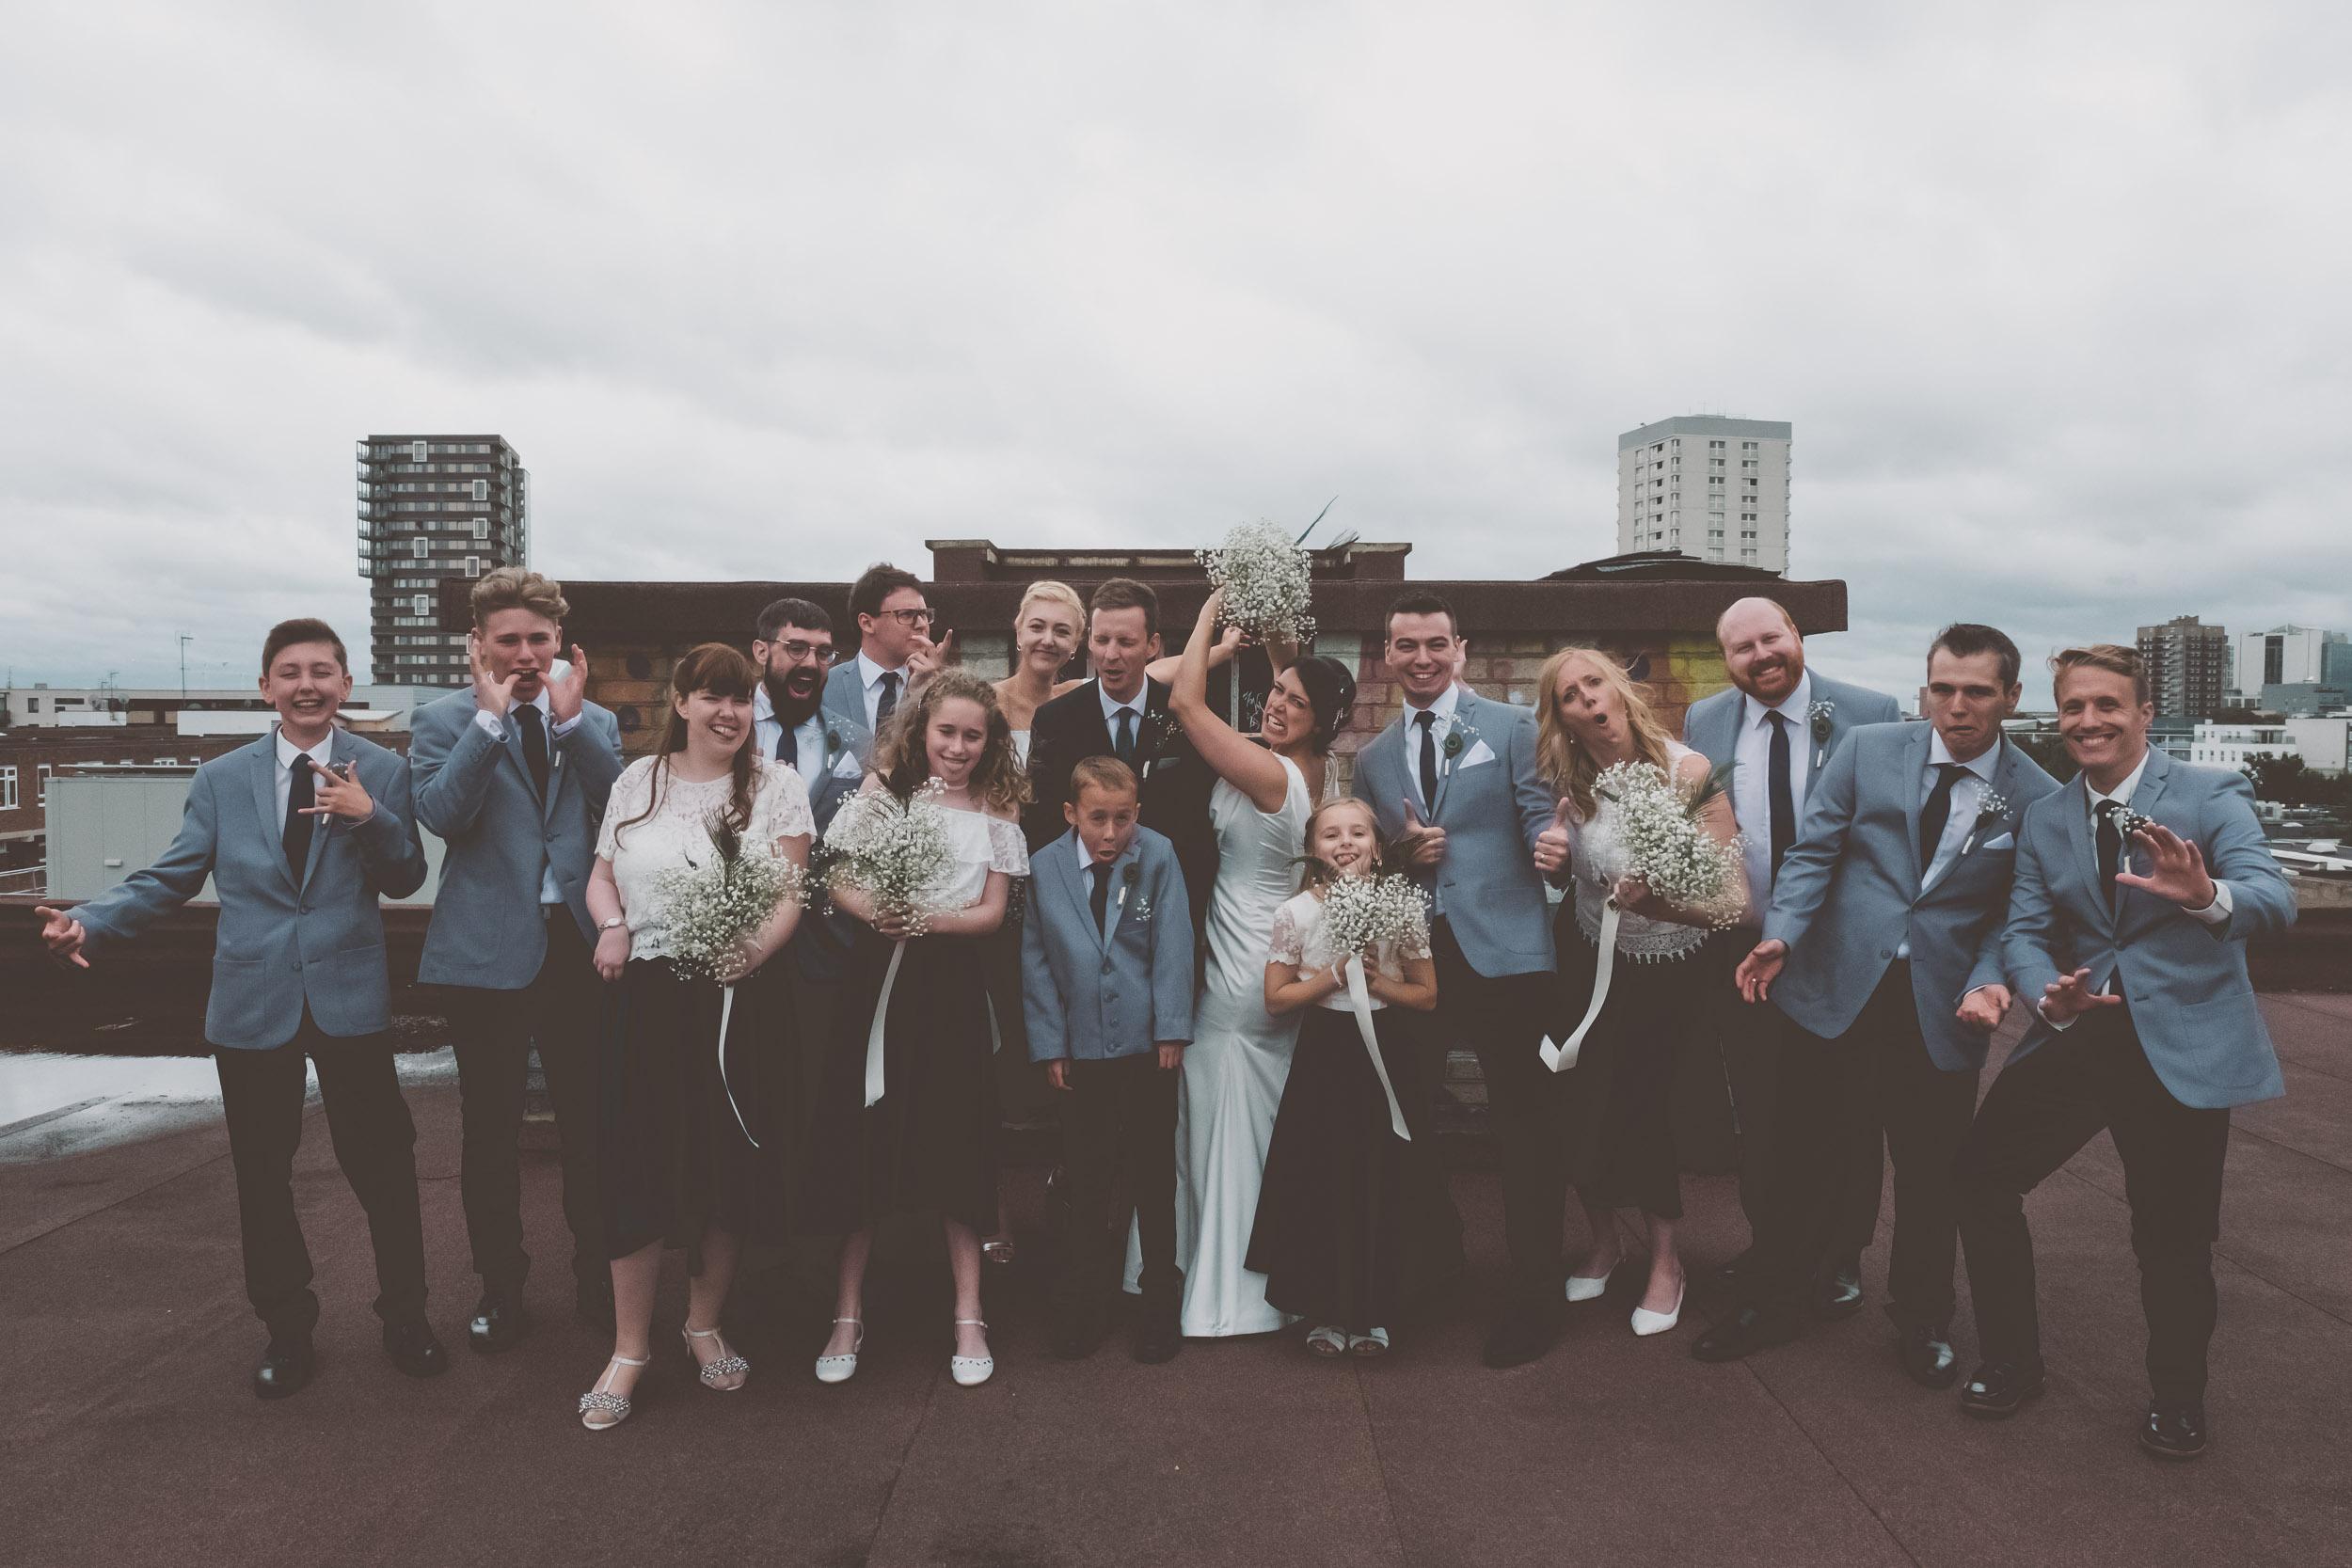 islington-town-hall-4th-floor-studios-wedding268.jpg